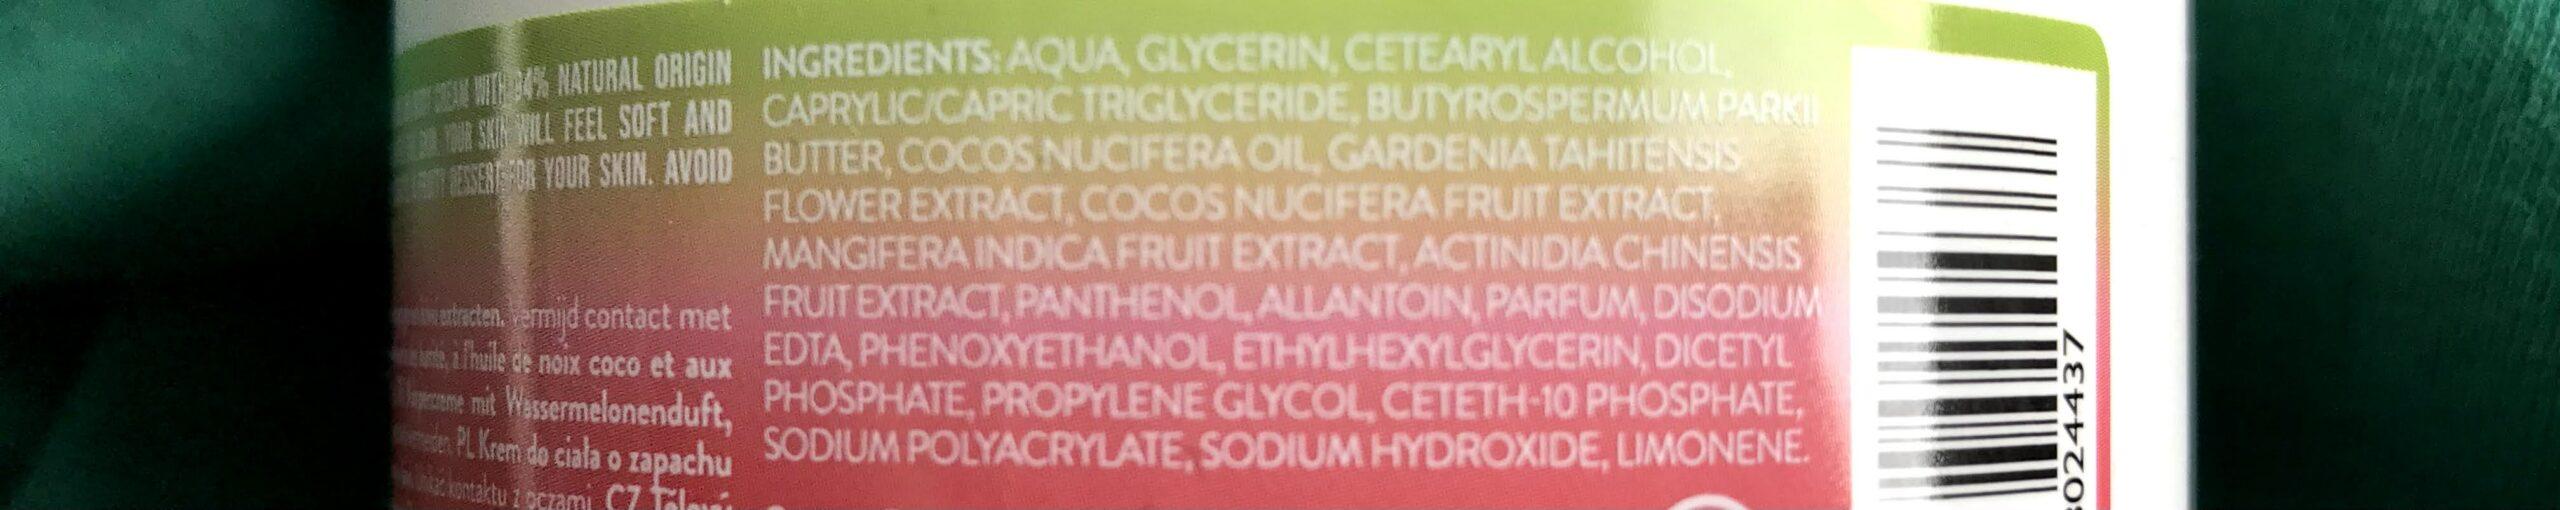 ingrediëntenlijst watermelon body cream